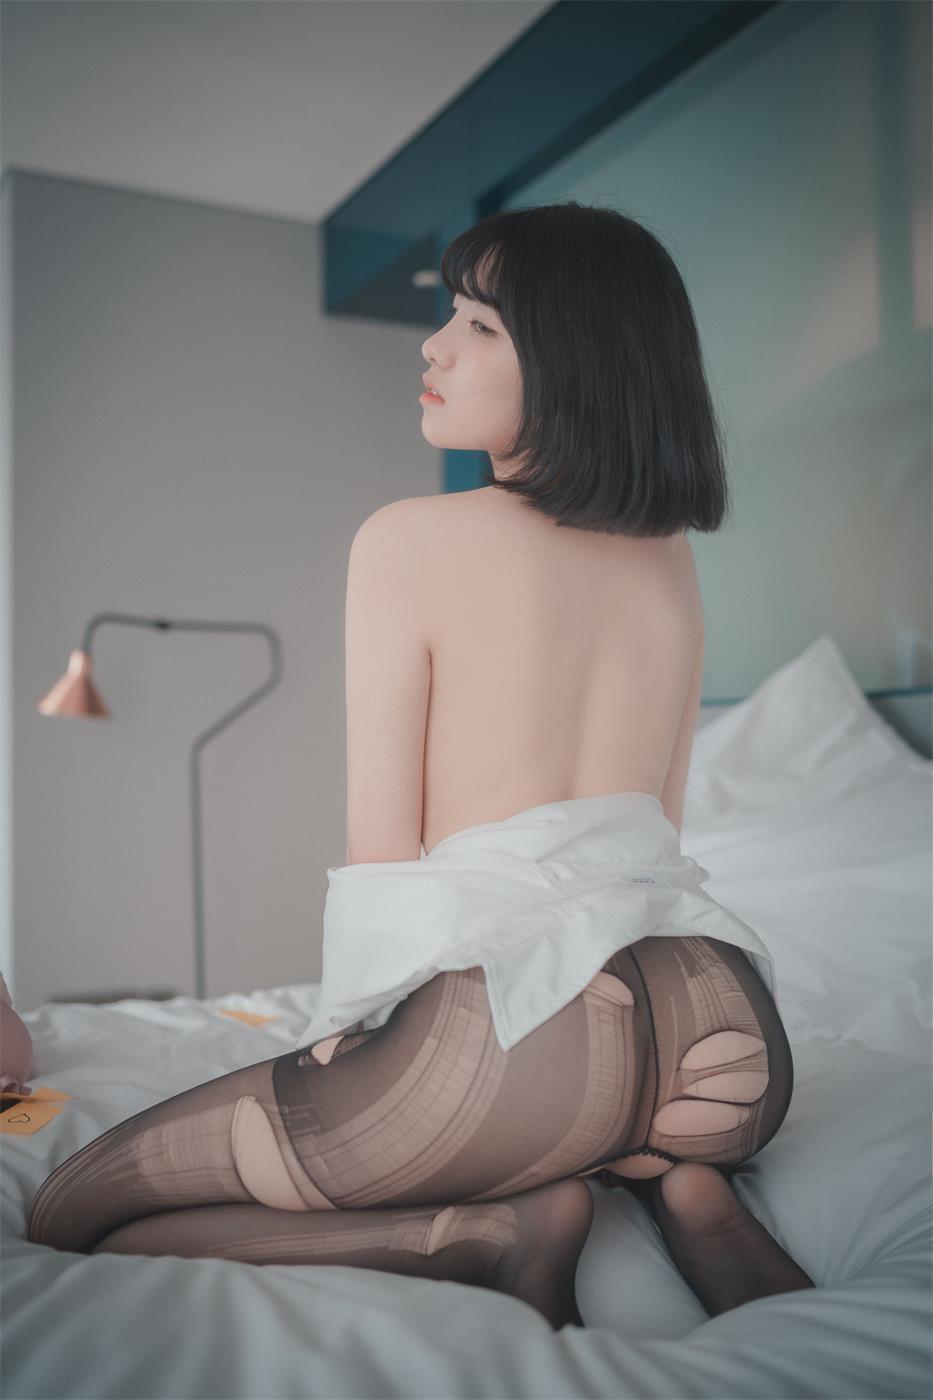 Sonson – 韩国性感萌妹子写真合集下载